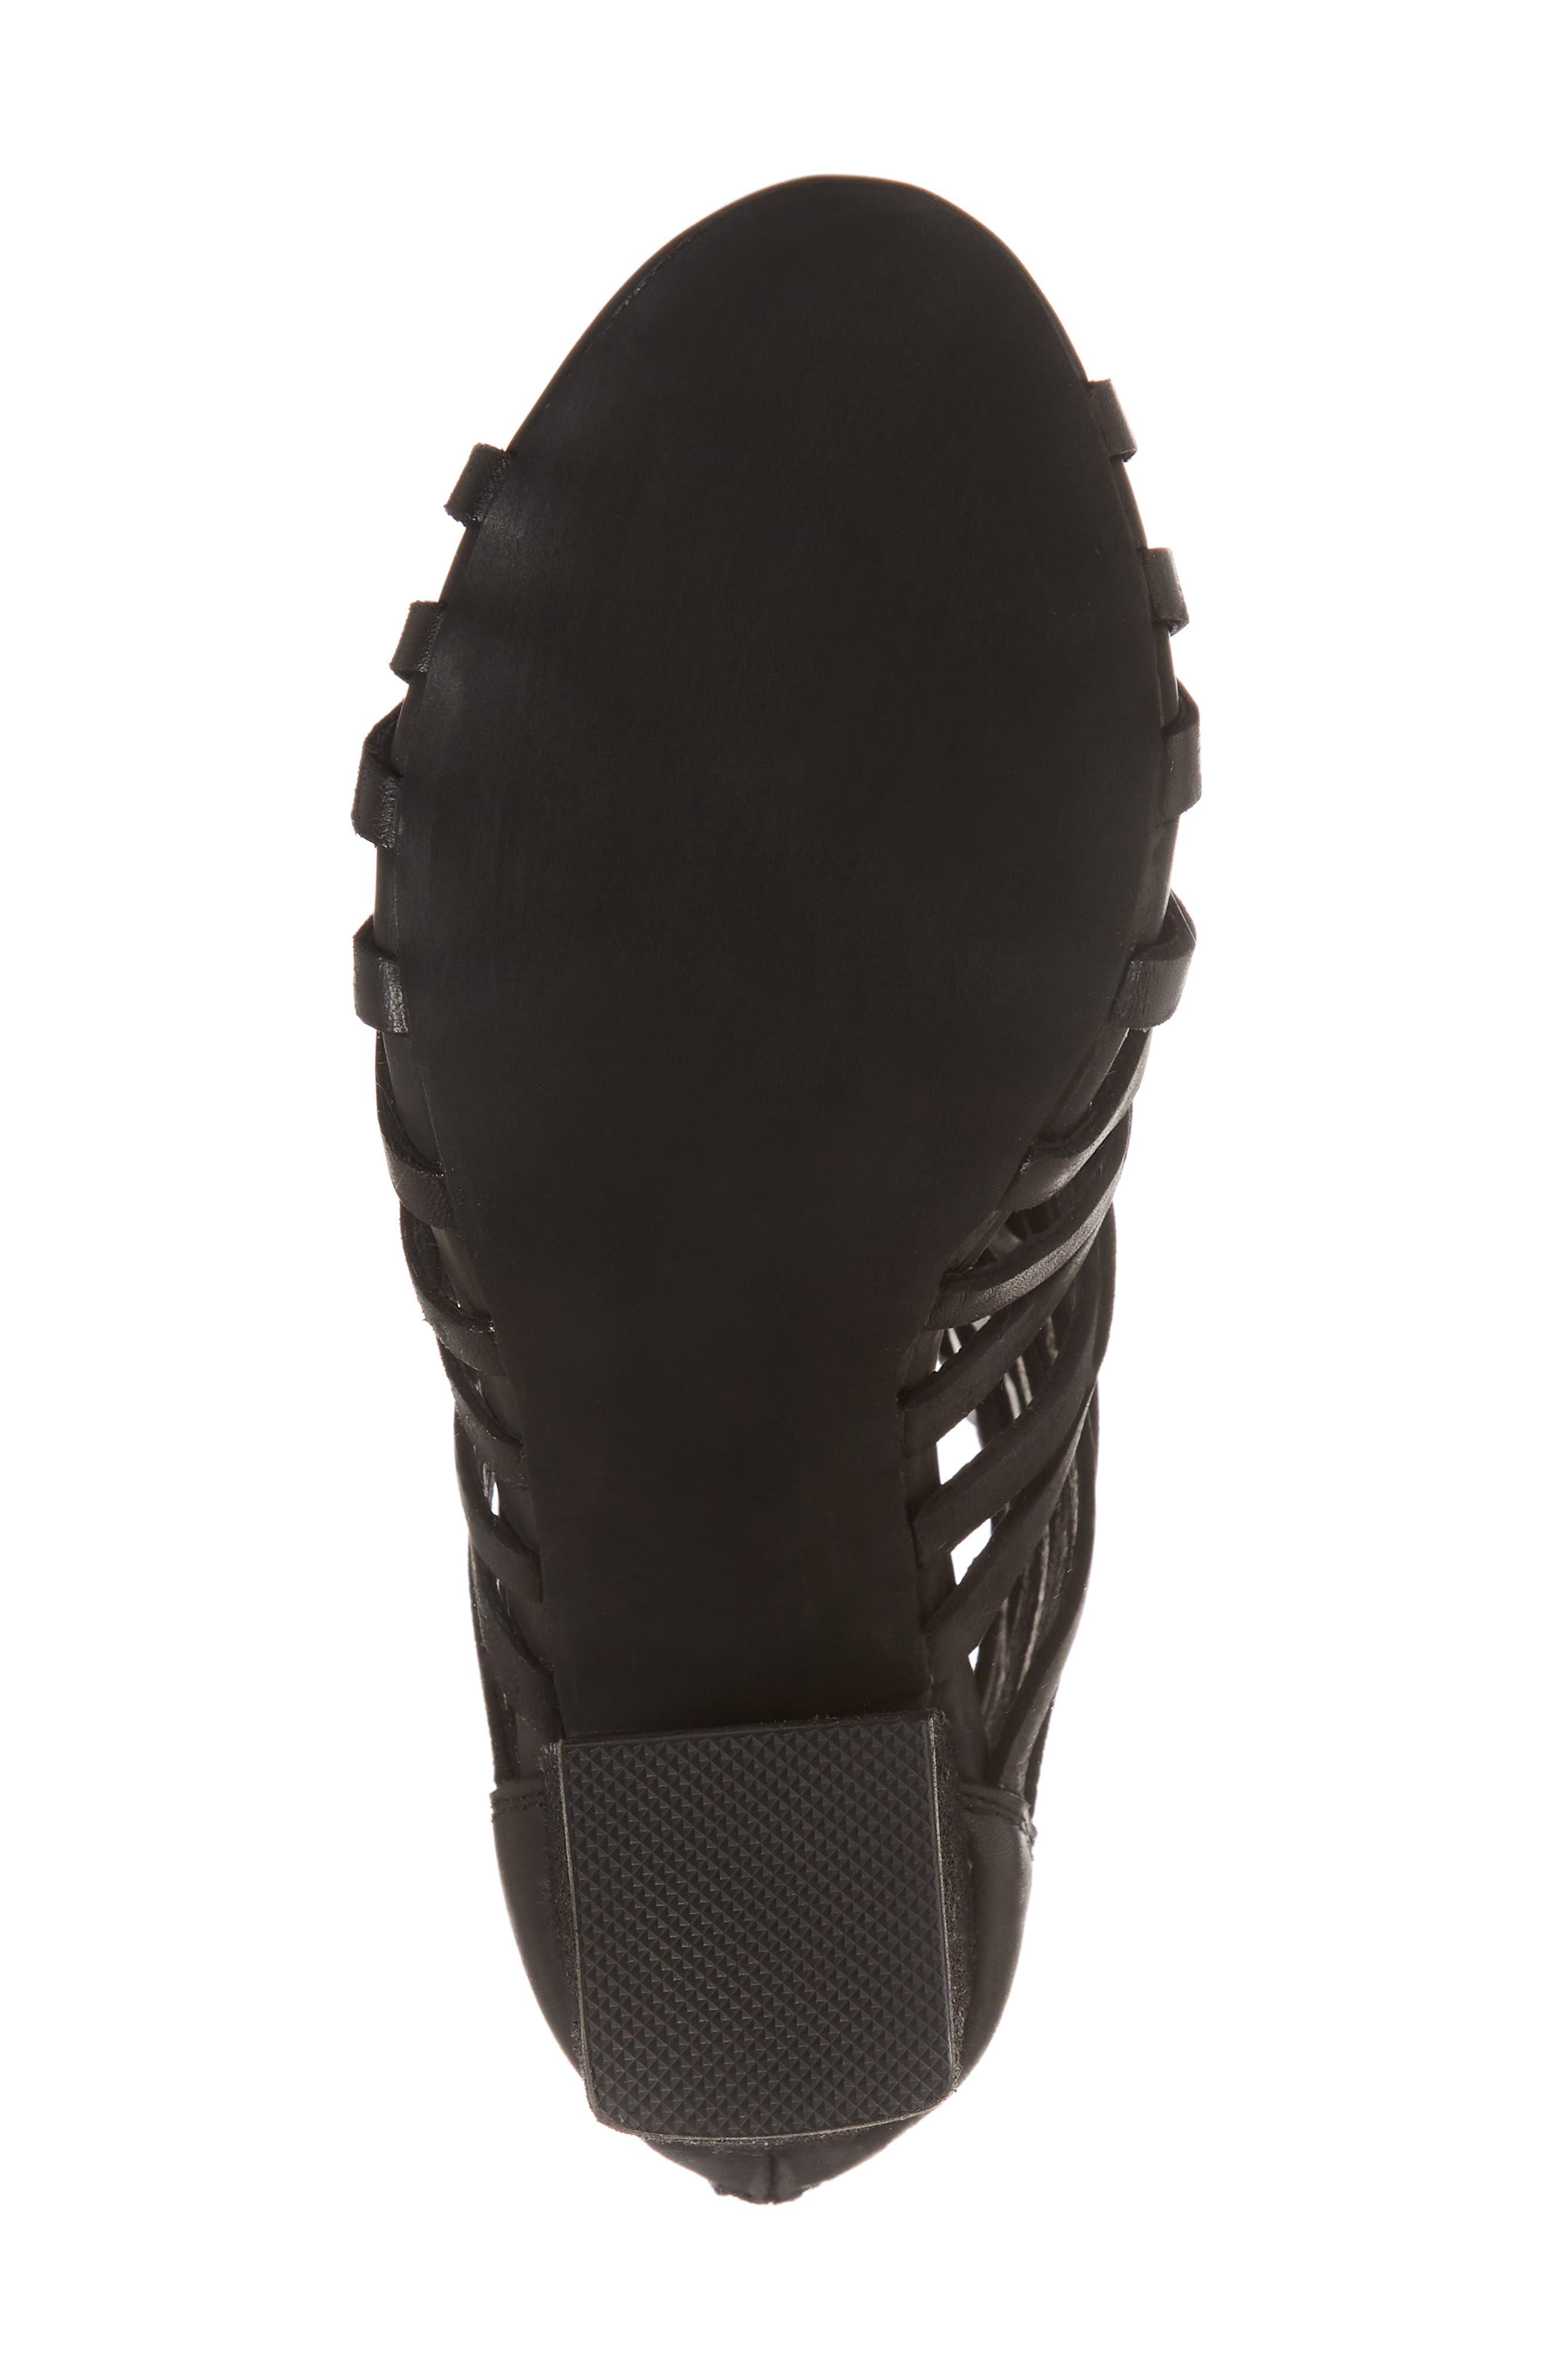 Despacito Bootie,                             Alternate thumbnail 6, color,                             Black Distressed Leather